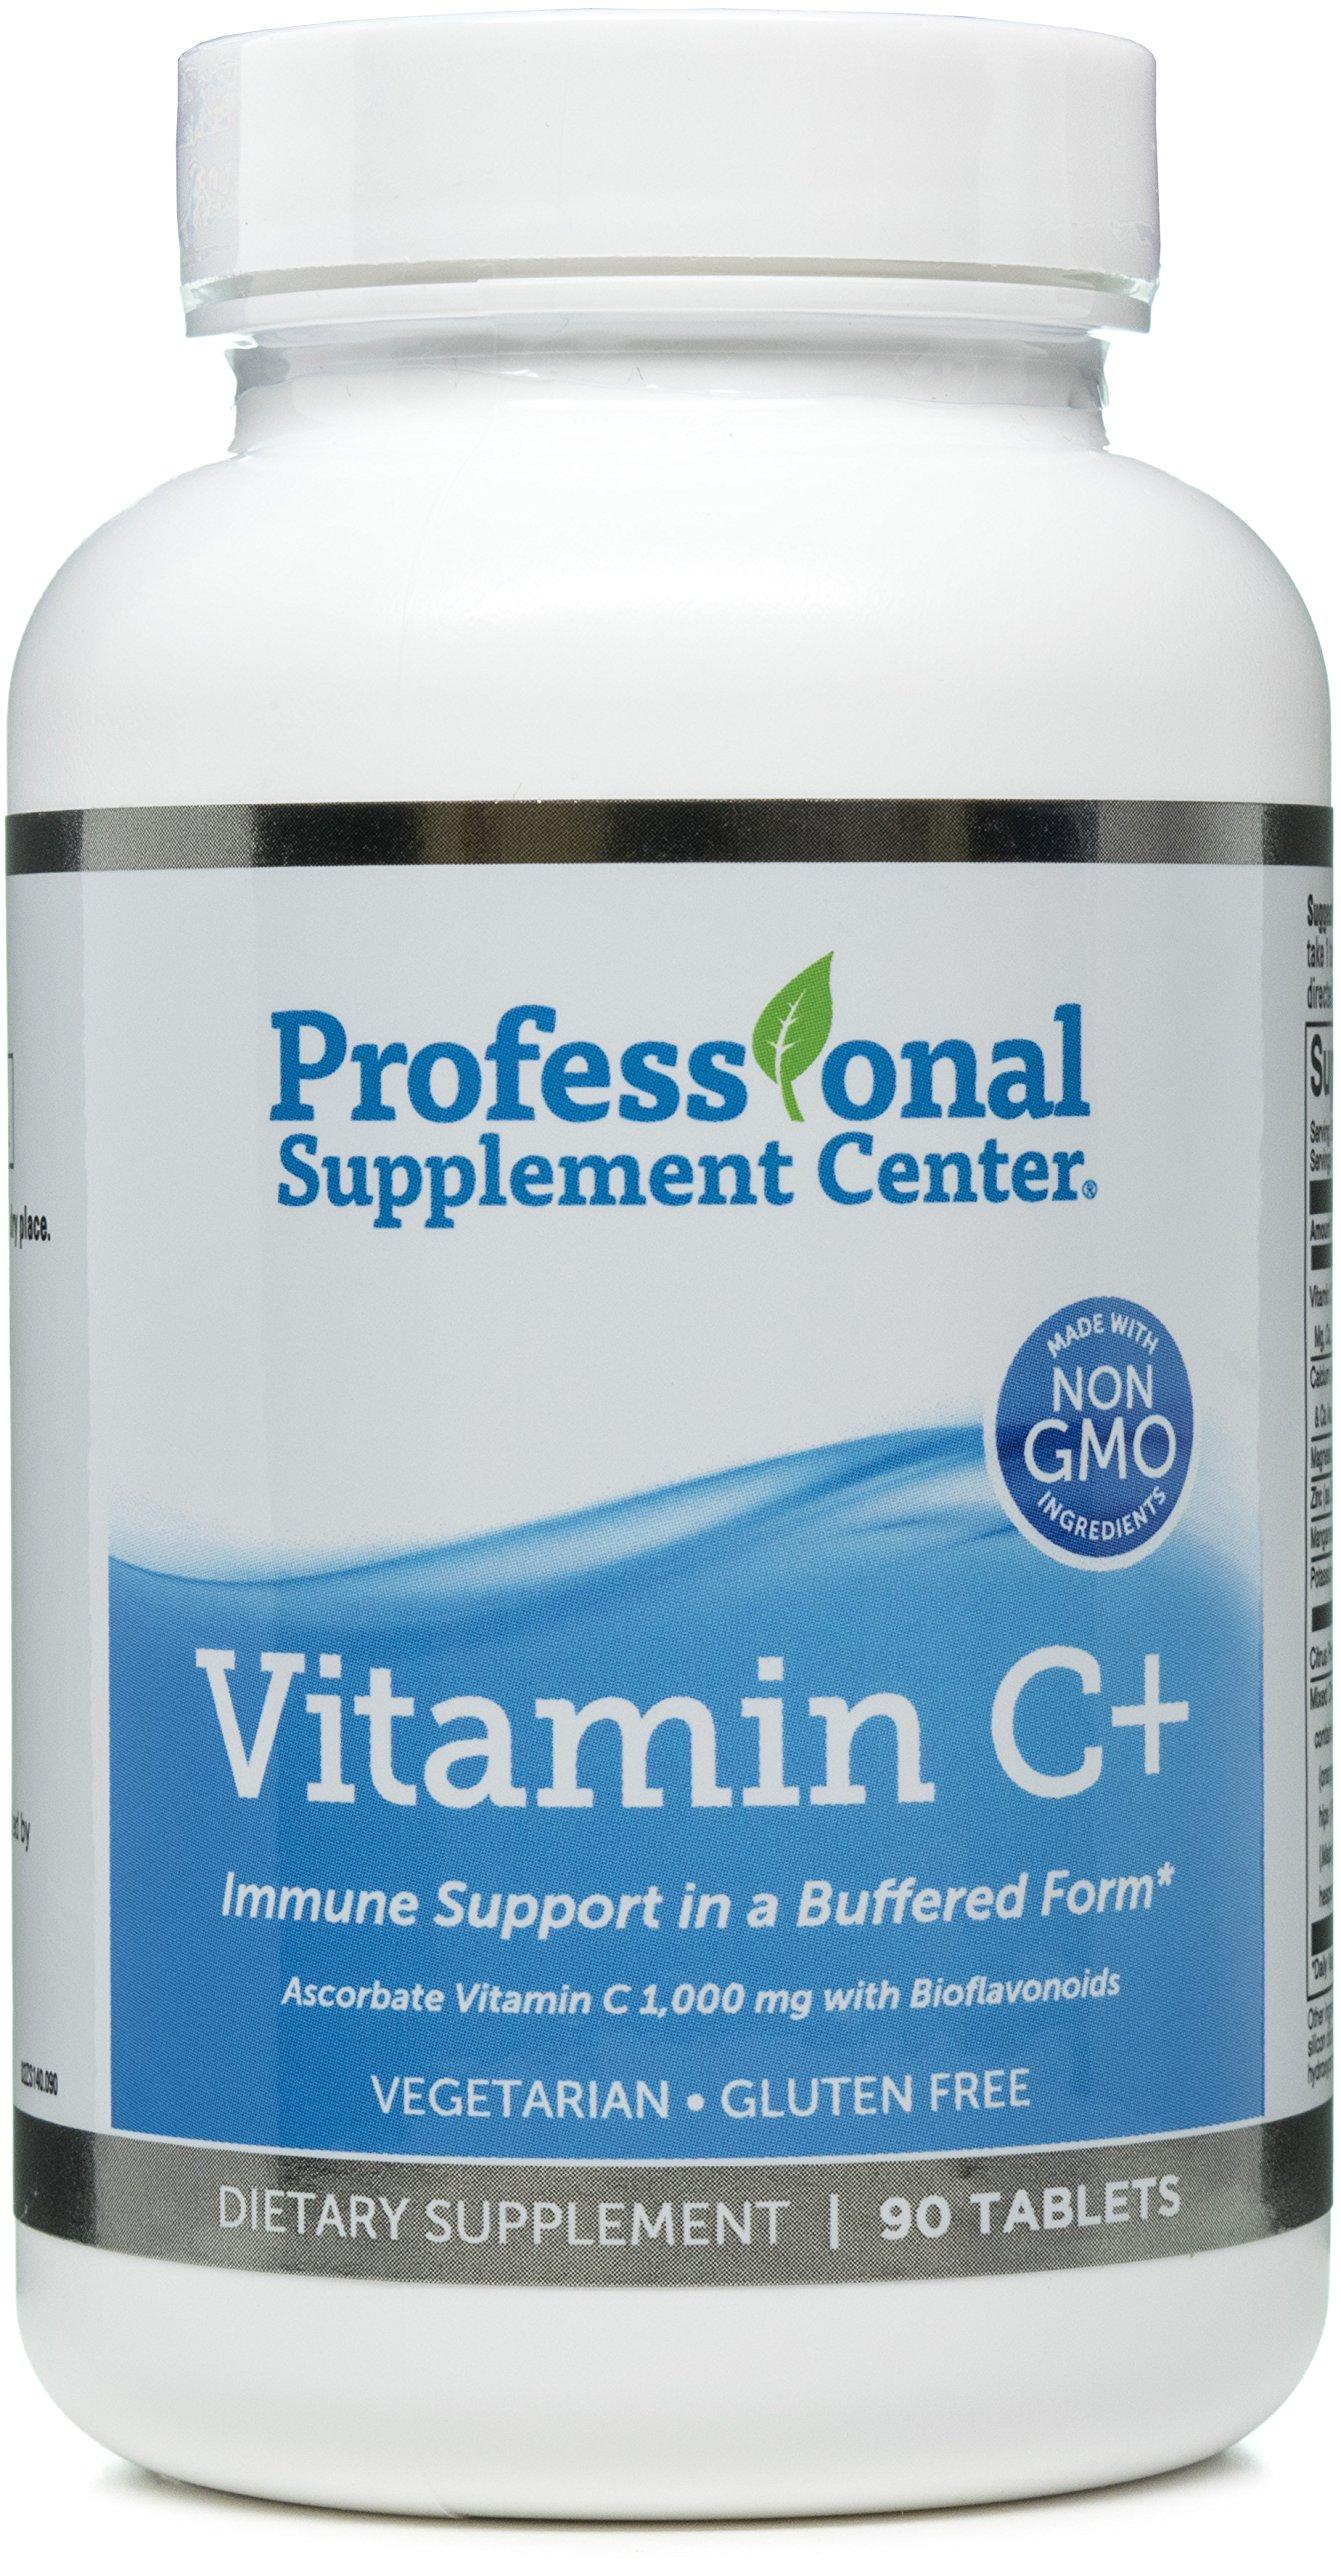 Professional Supplement Center - Vitamin C + - 90 Tablets